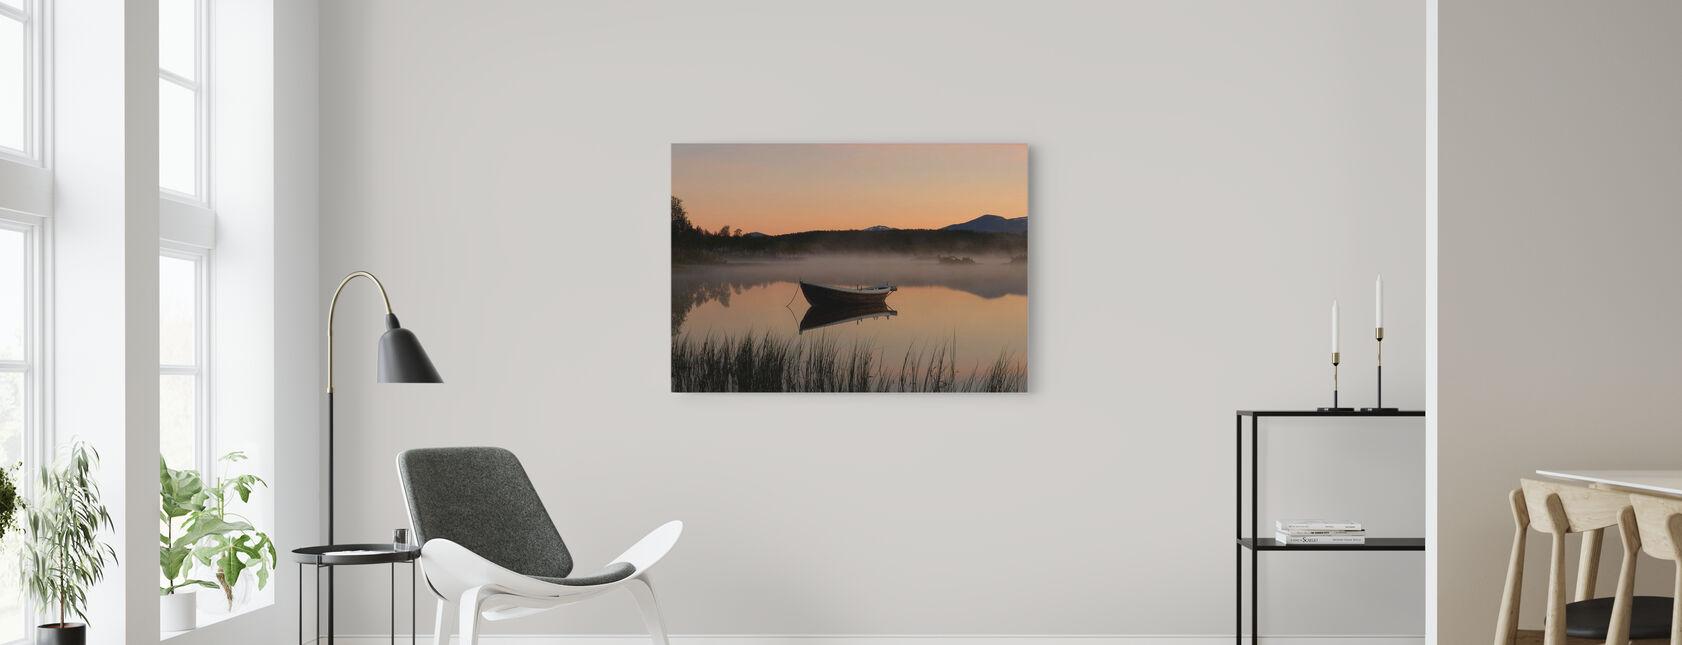 Fredelig kveld ved innsjøen, Senja Norge - Lerretsbilde - Stue